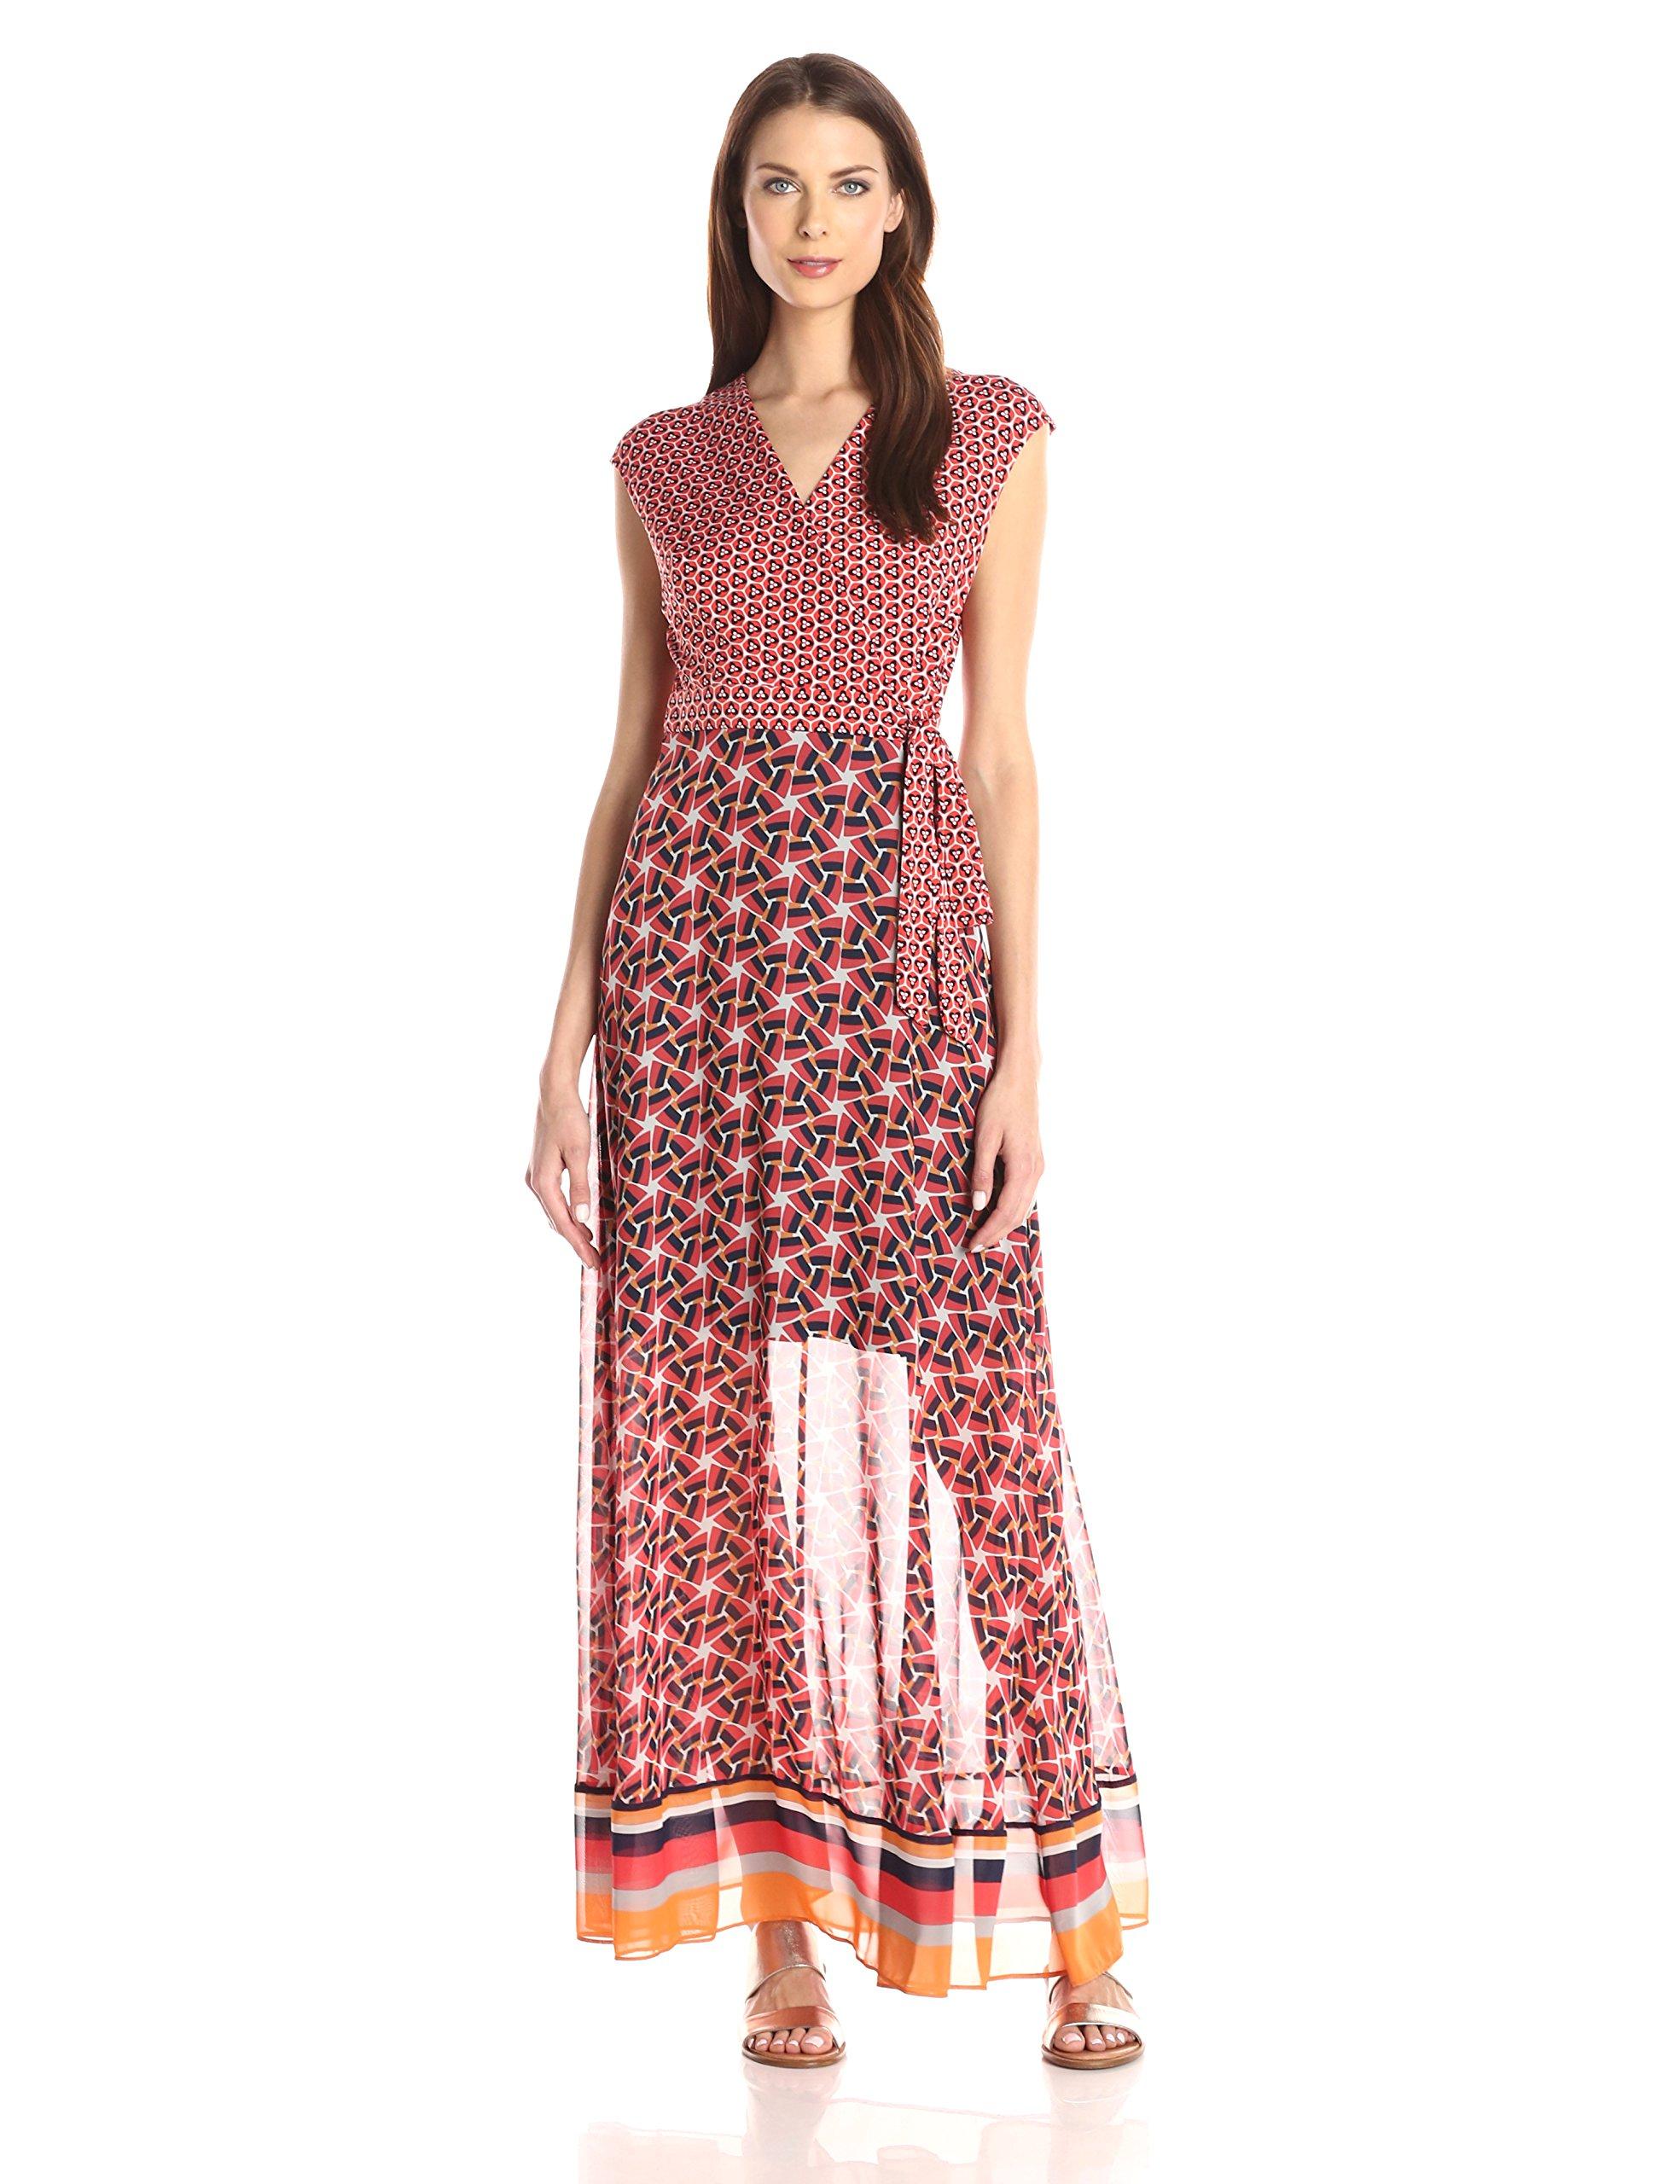 Taylor Dresses Women's V Neck Wrap Long Jersey Maxi Wth Chiffon Skirt, Poppy/Tang, 10